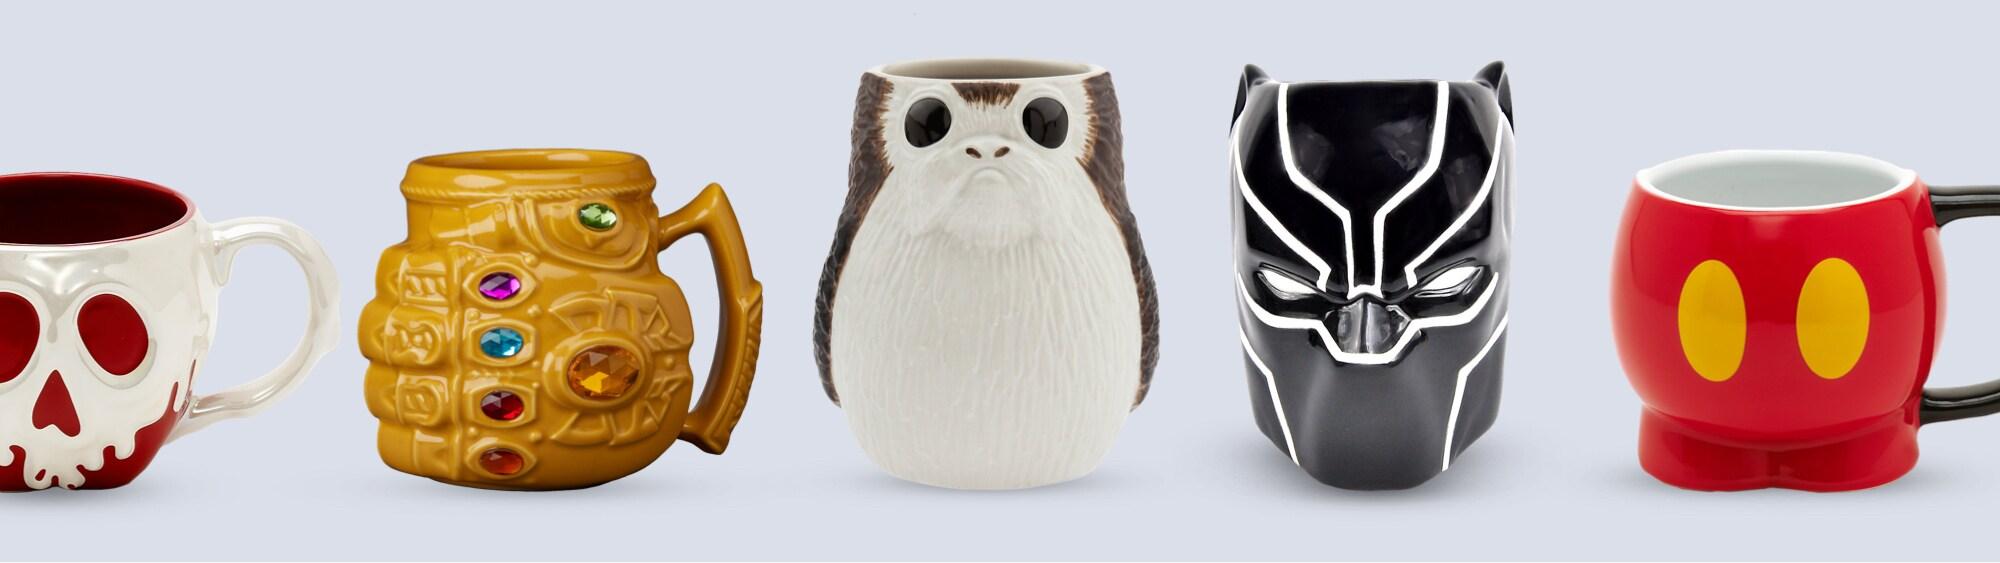 Disney Store | 12 Mugs